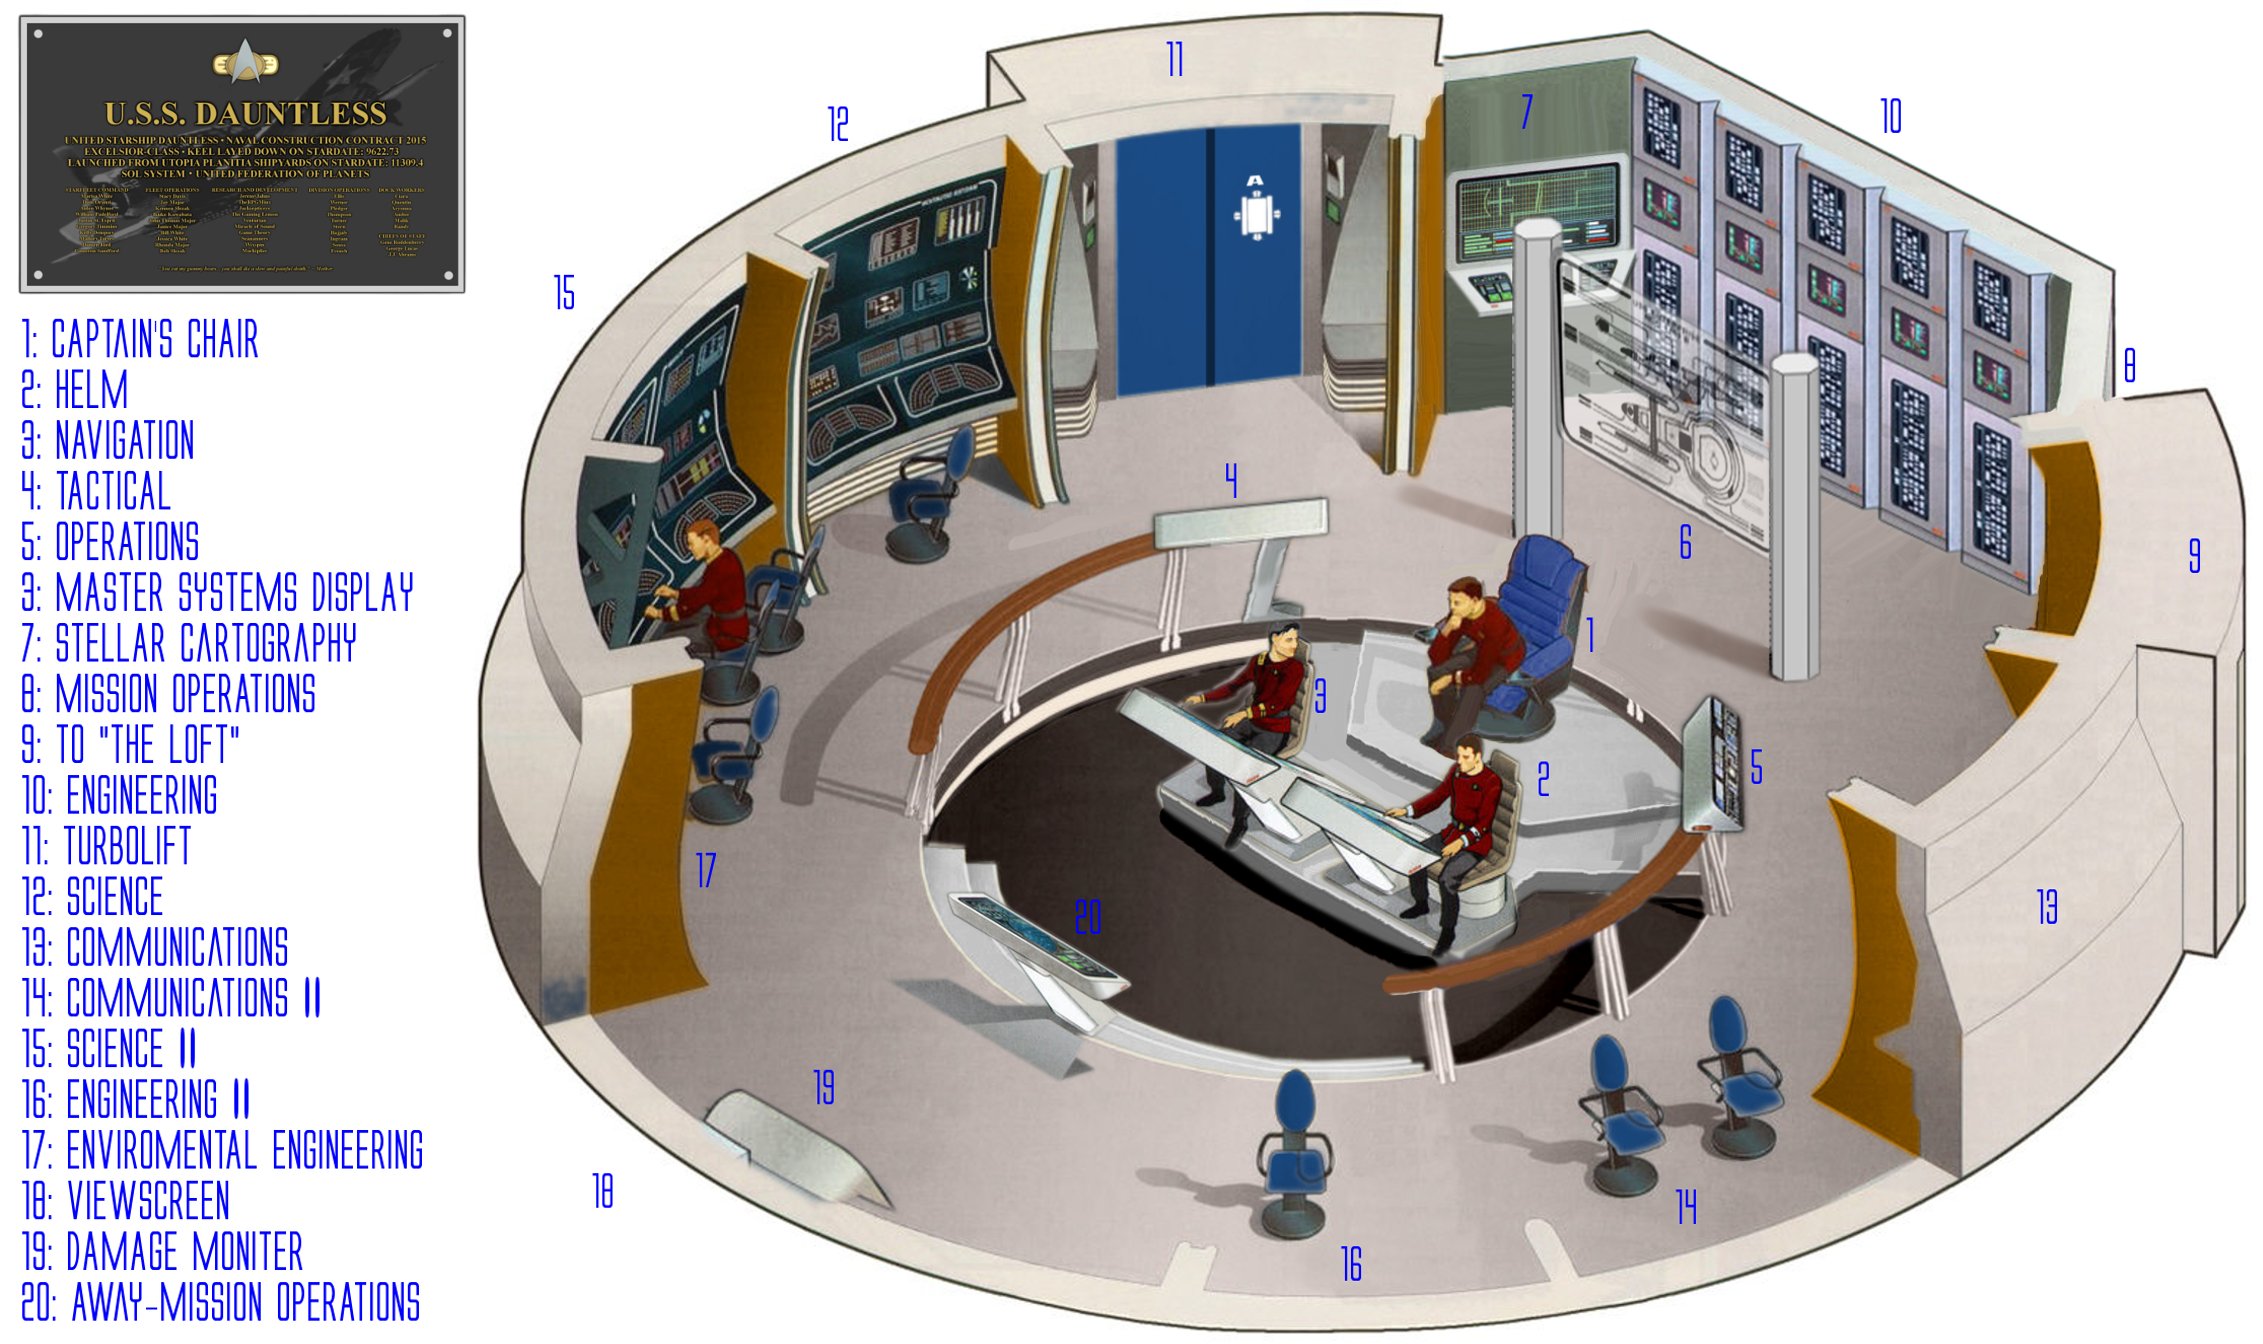 ST U S S Dauntless Bridge 512037804 on Star Trek Deep Space Nine Interior